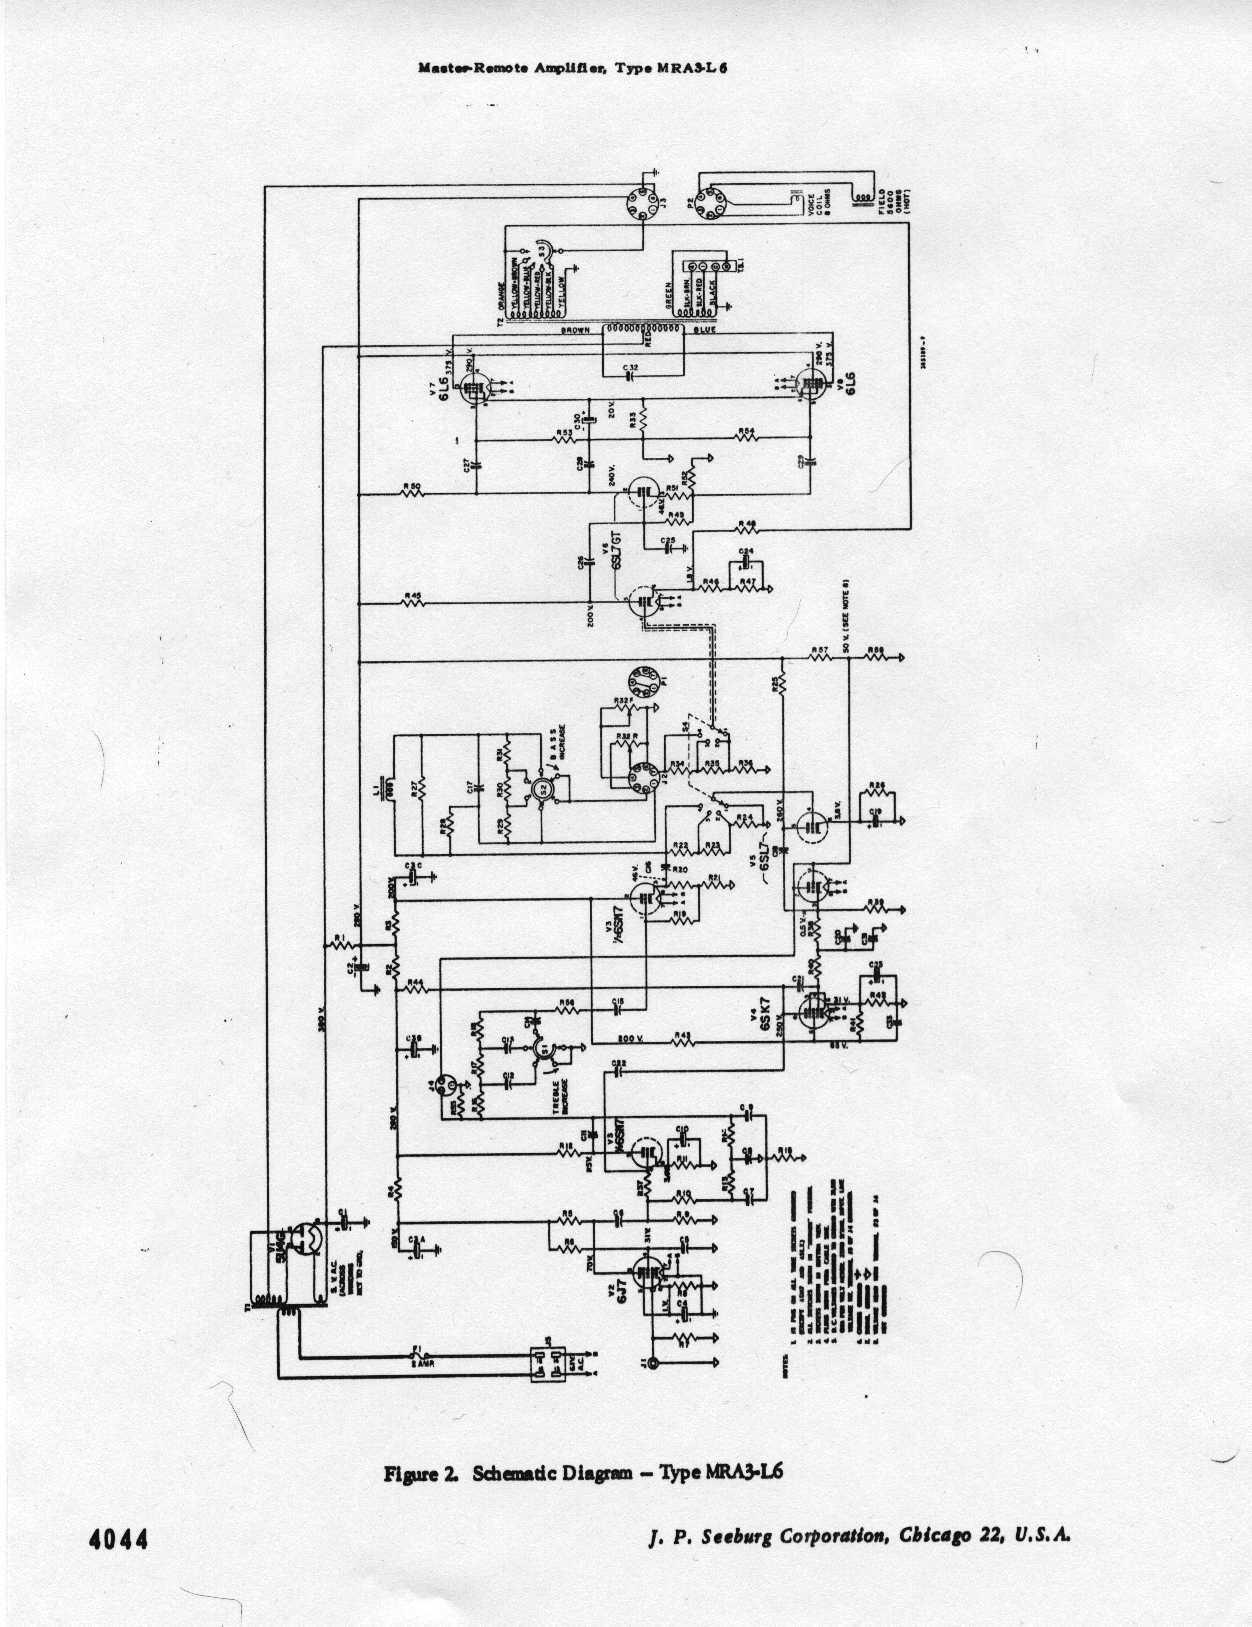 Schema Elettrico Jukebox Seeburg : Seeburg b amp modifications